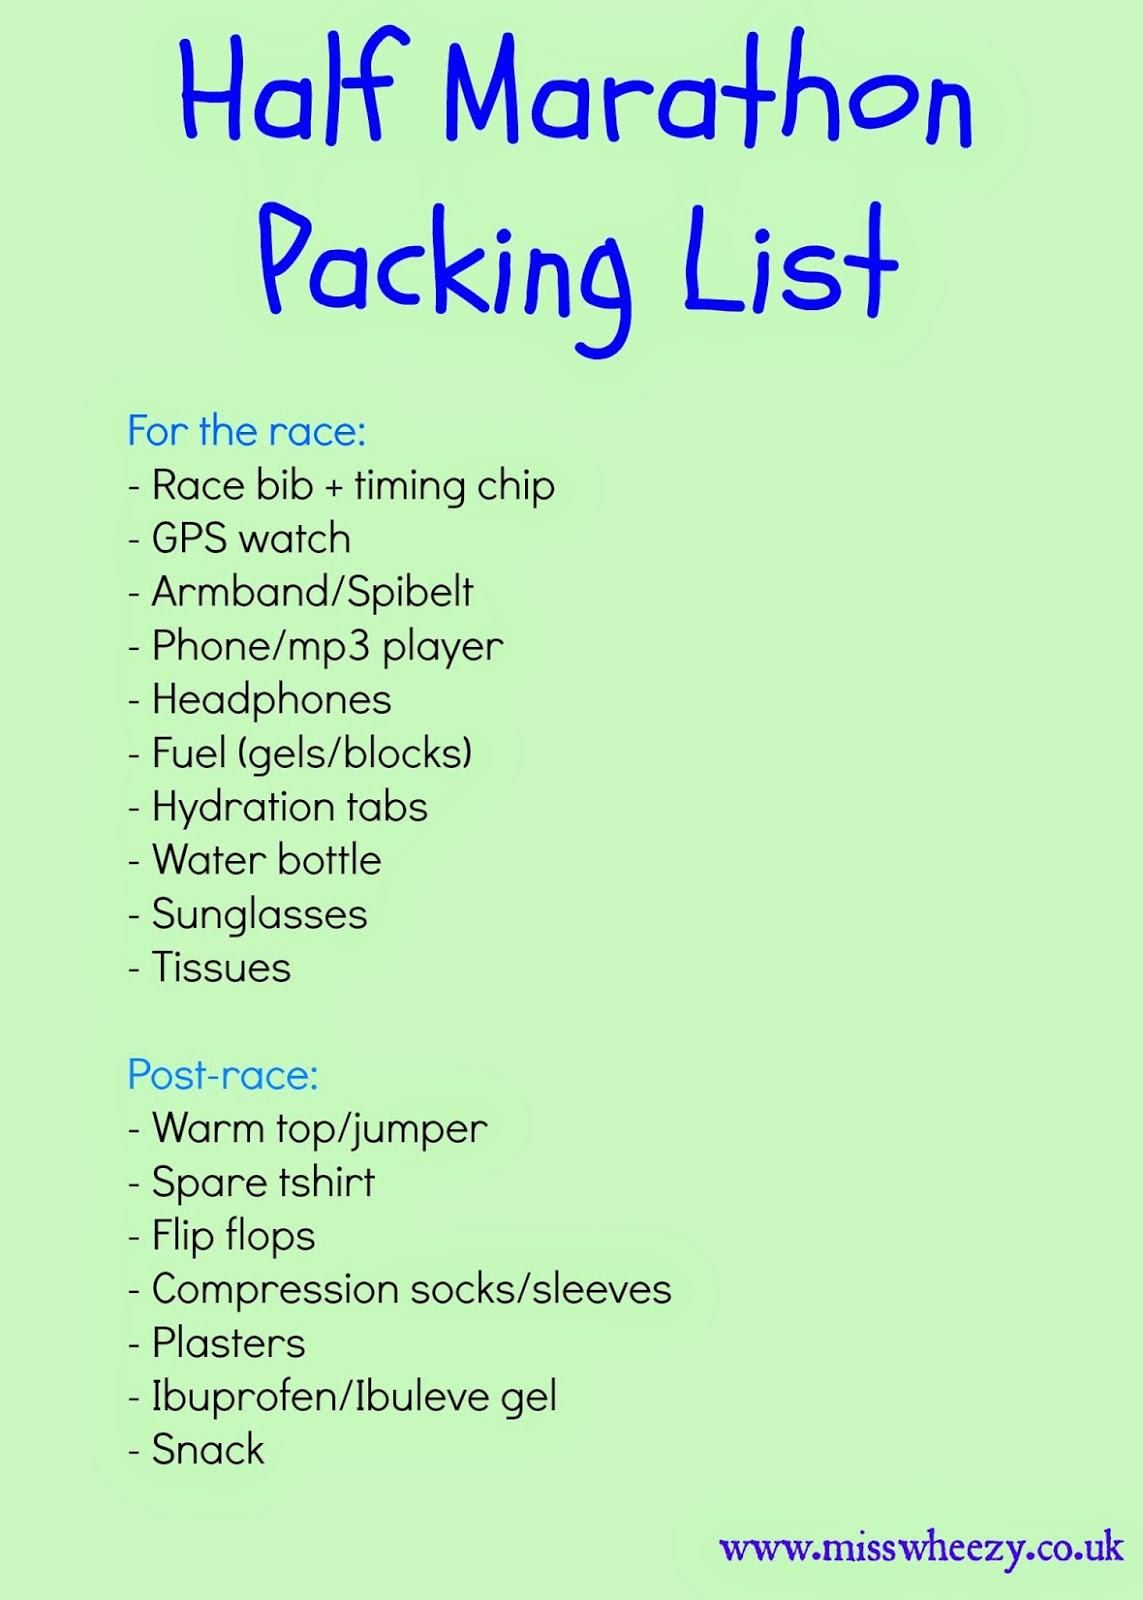 Half Marathon Race Day Packing List